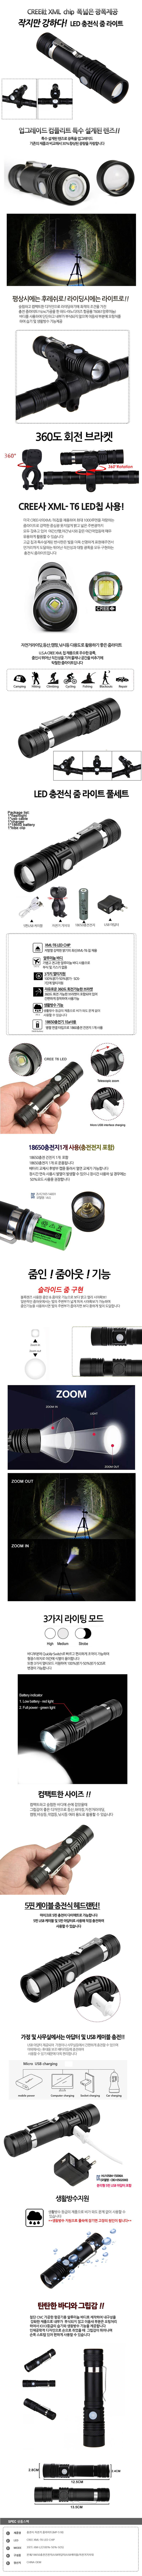 donghwa LED light renton MP518-d.jpg